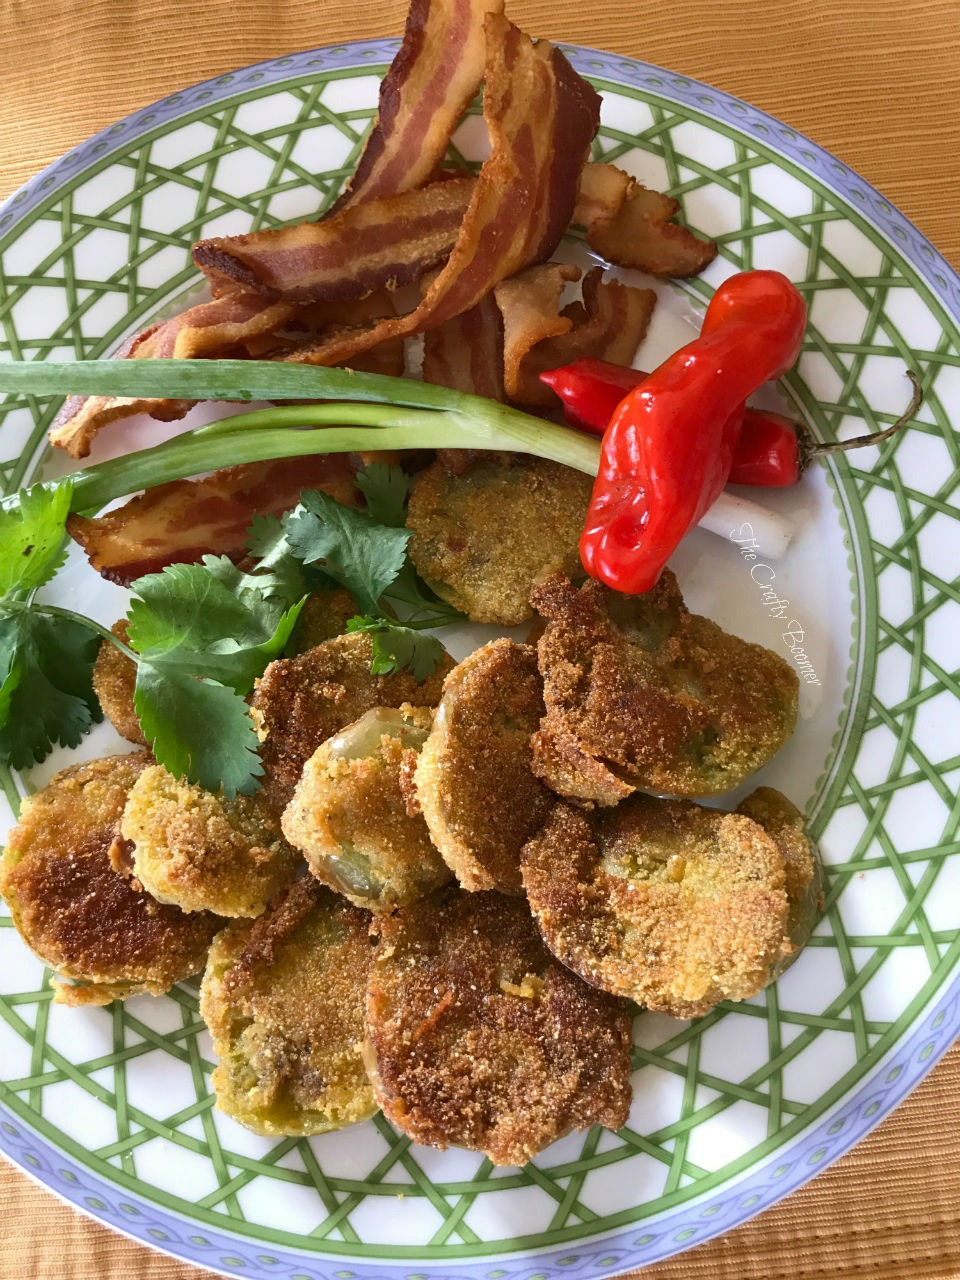 Fried green tomato essay